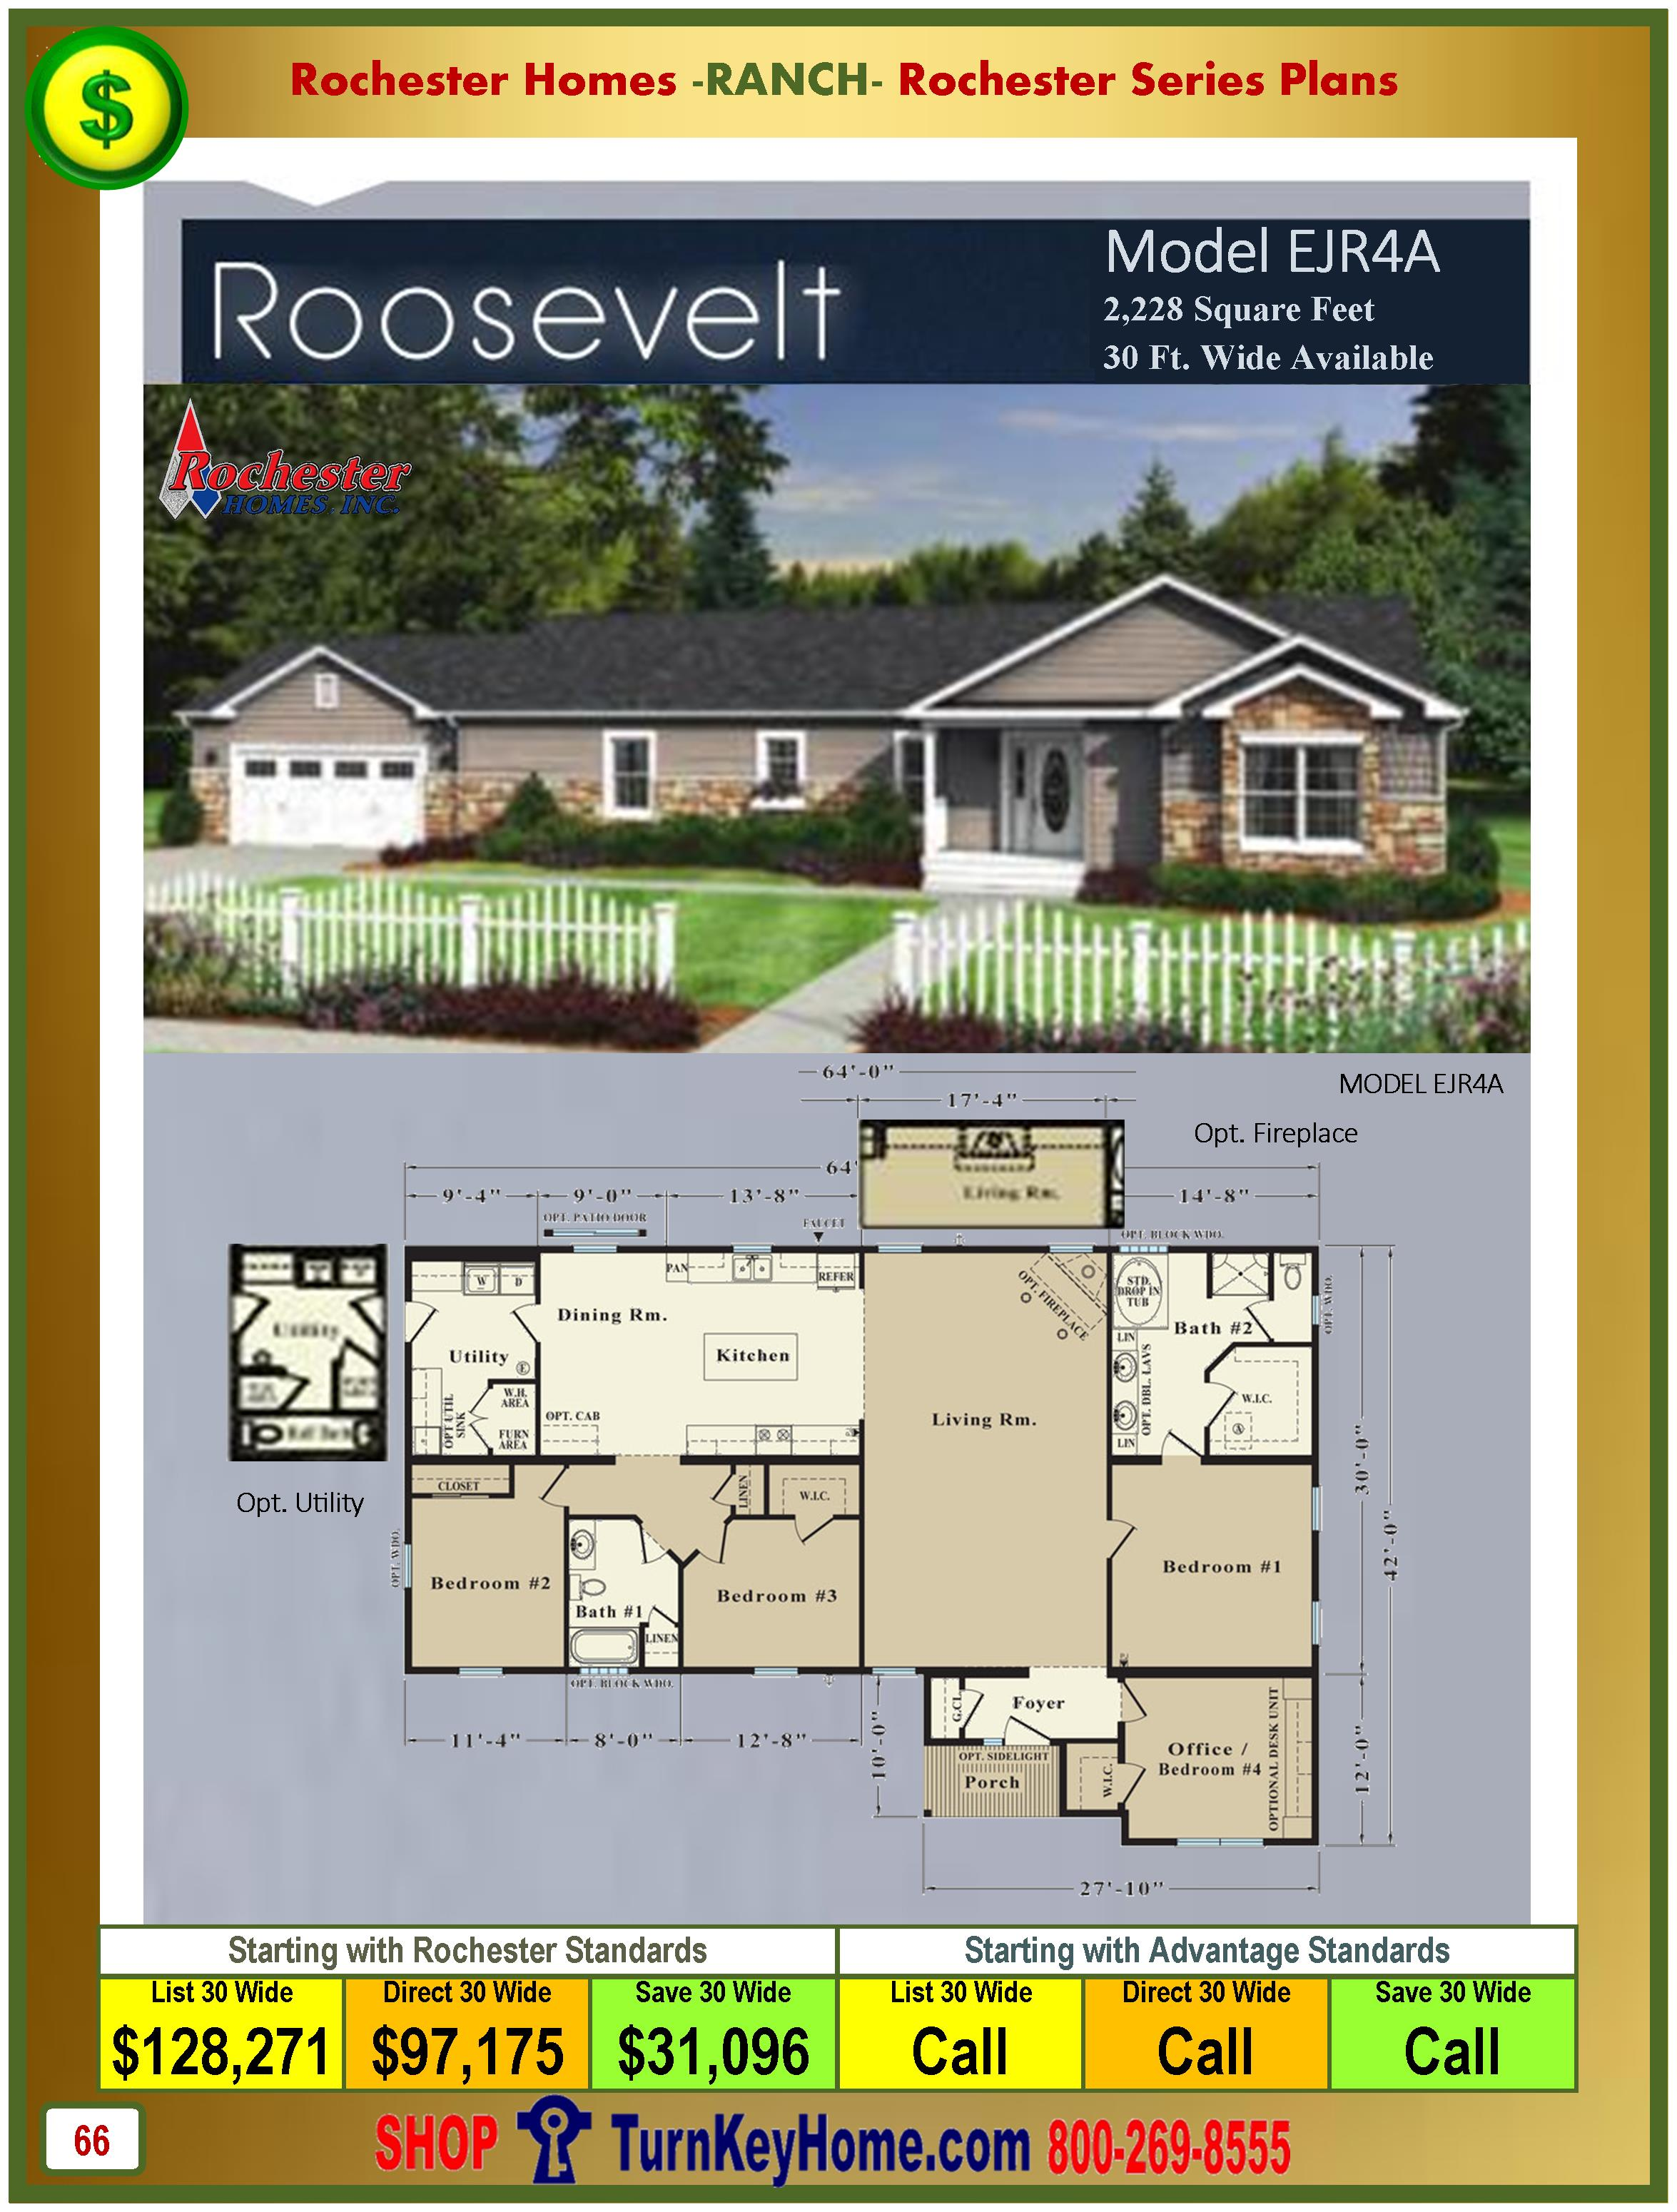 Price Modular Homes roosevelt rochester modular home model ejr4a plan price